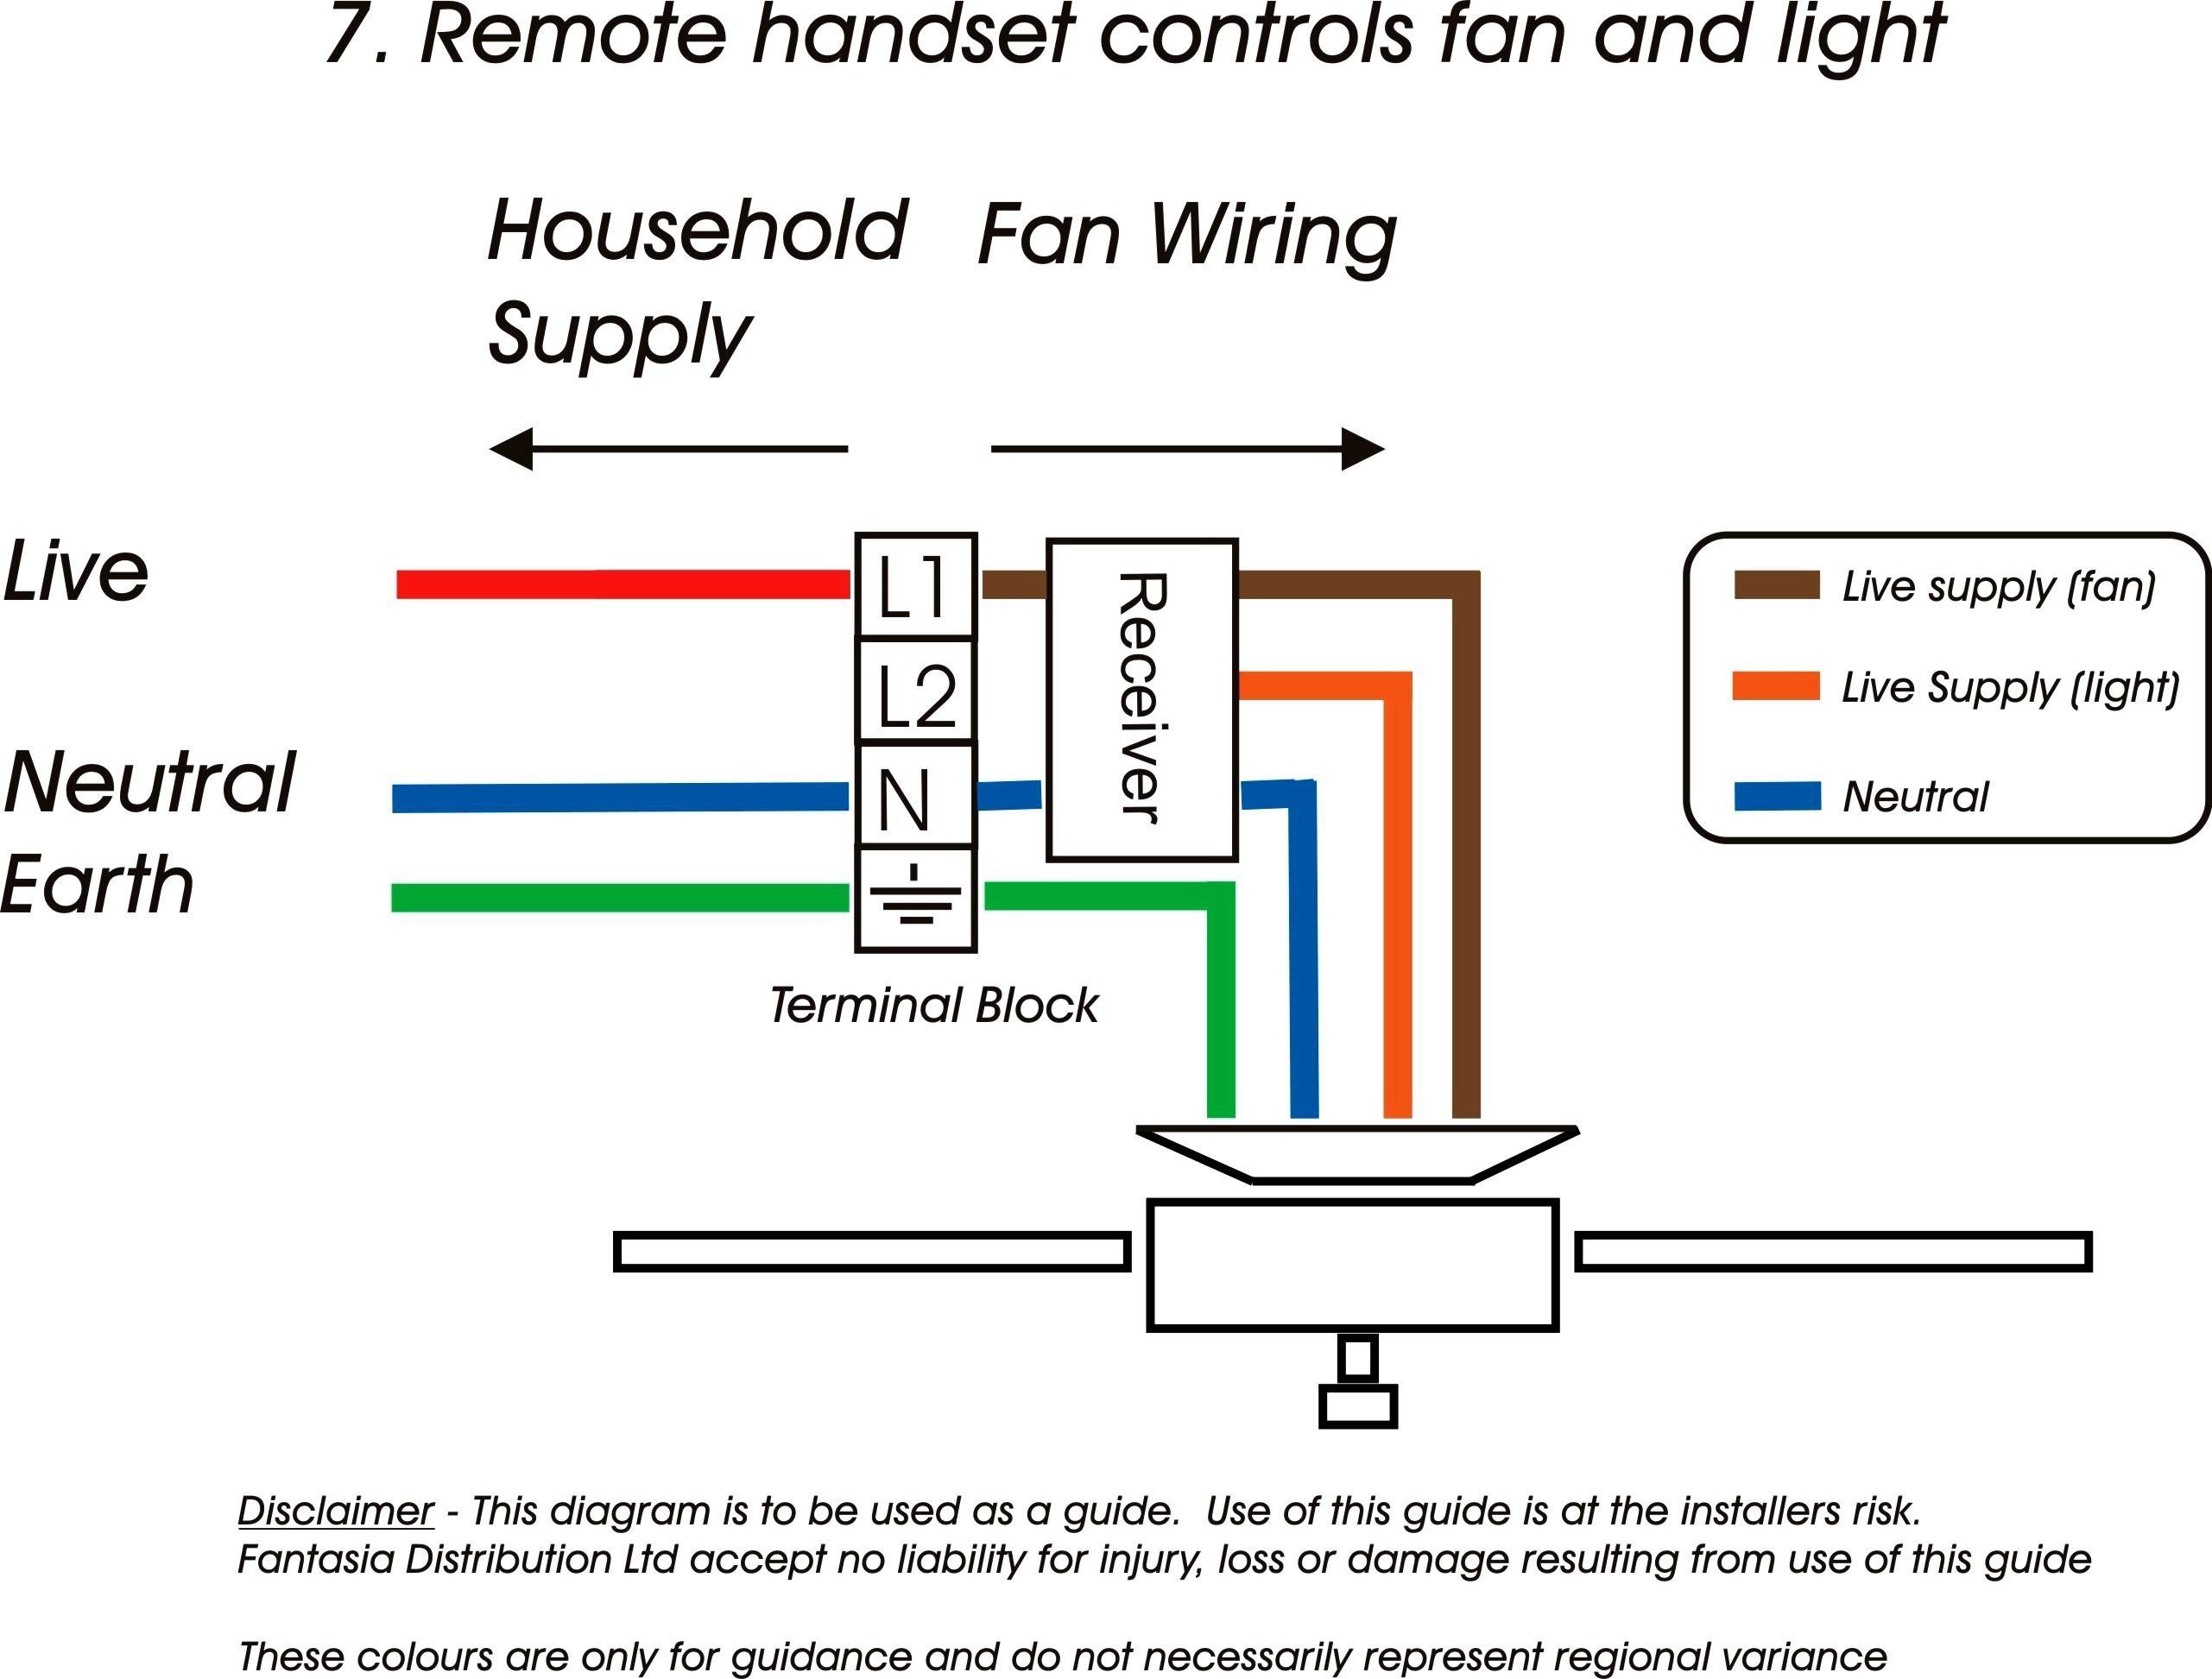 Switch Hampton Bay Ceiling Fan Wiring Diagram from static-cdn.imageservice.cloud